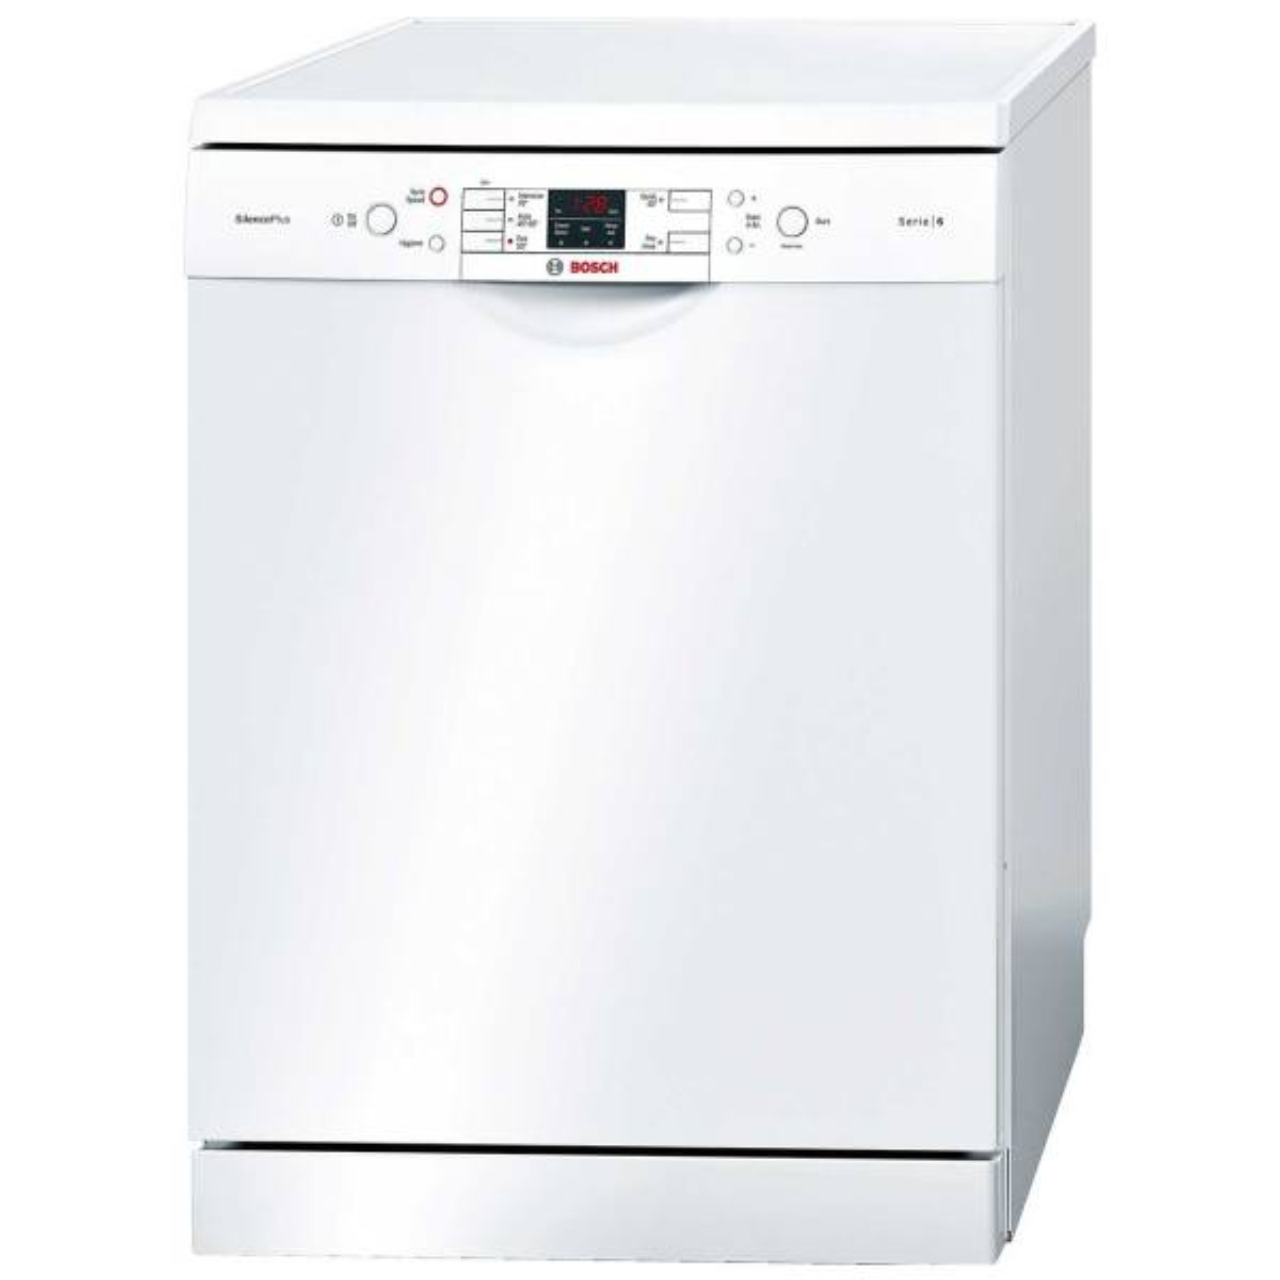 ماشین ظرفشویی بوش مدل  SMS58M02IR   Bosch SMS58M02IR Dishwasher